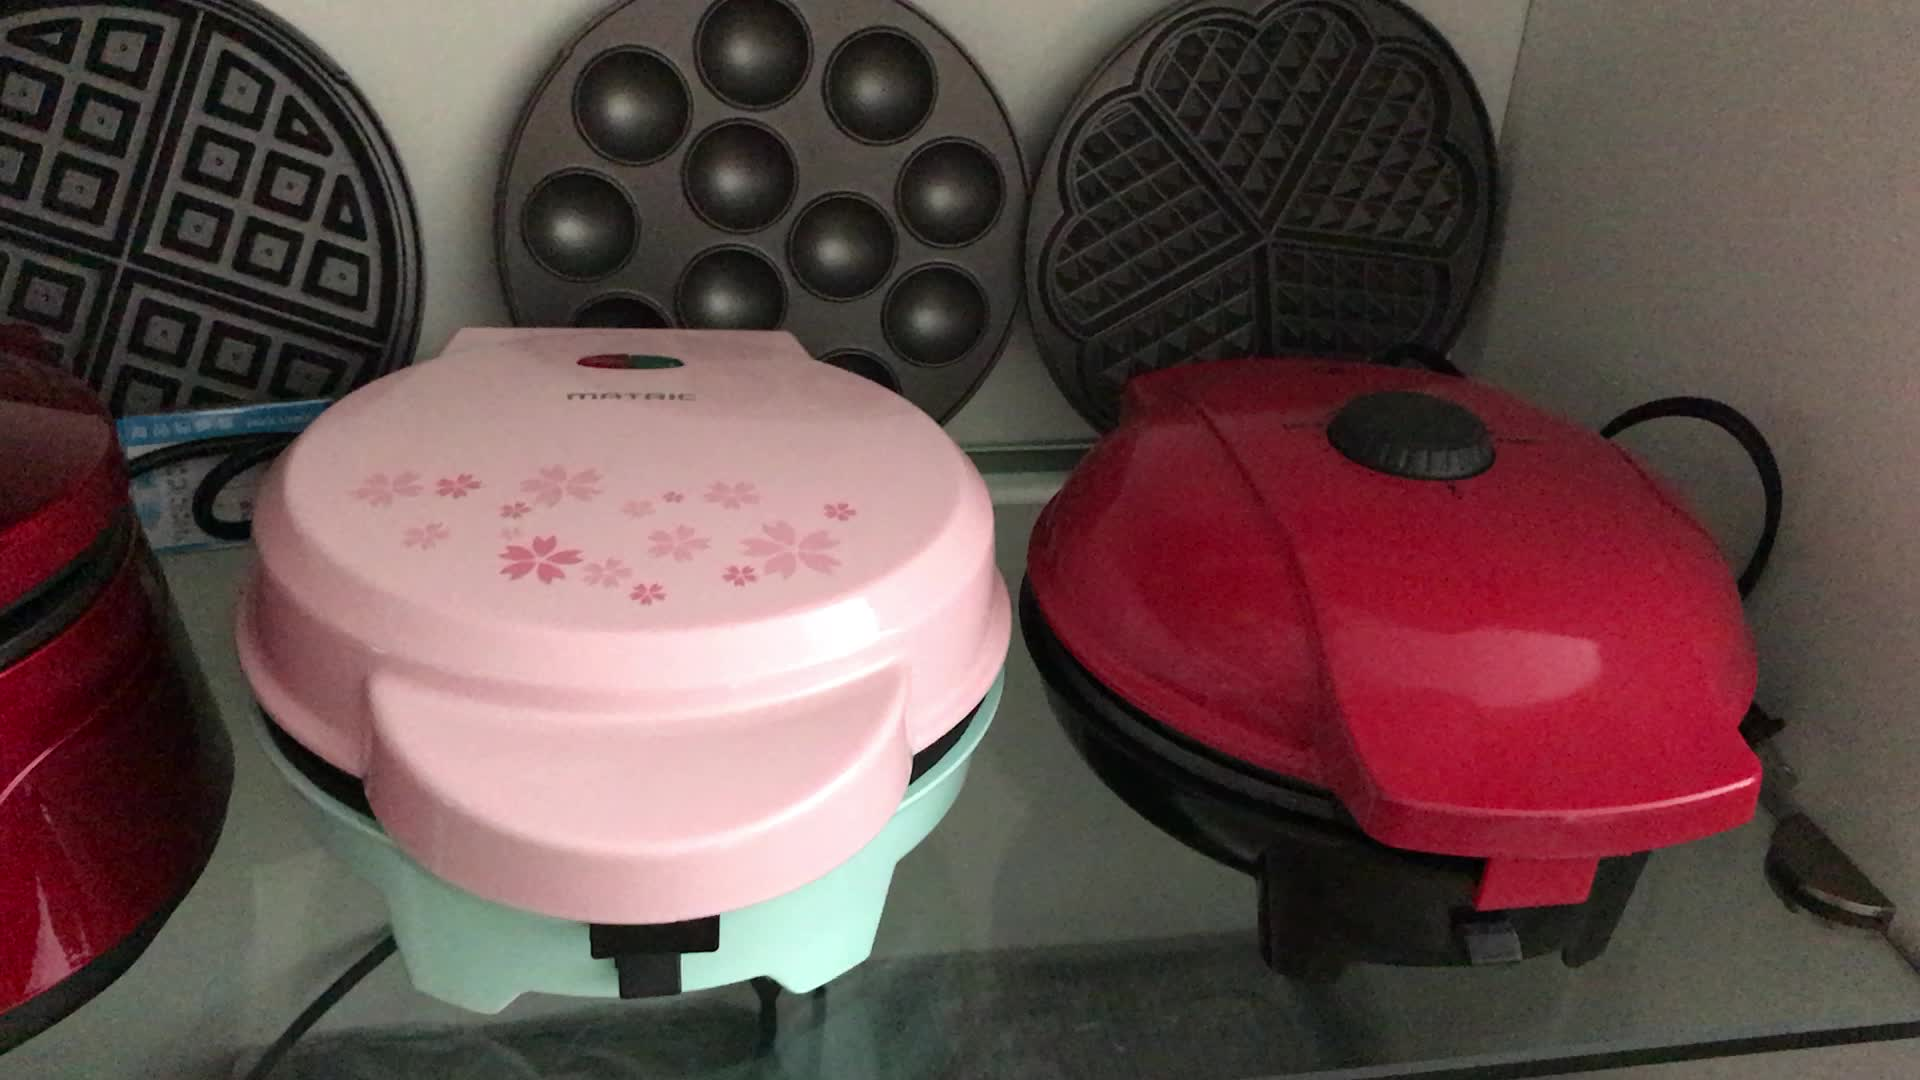 7 pcs automatic donut hole maker